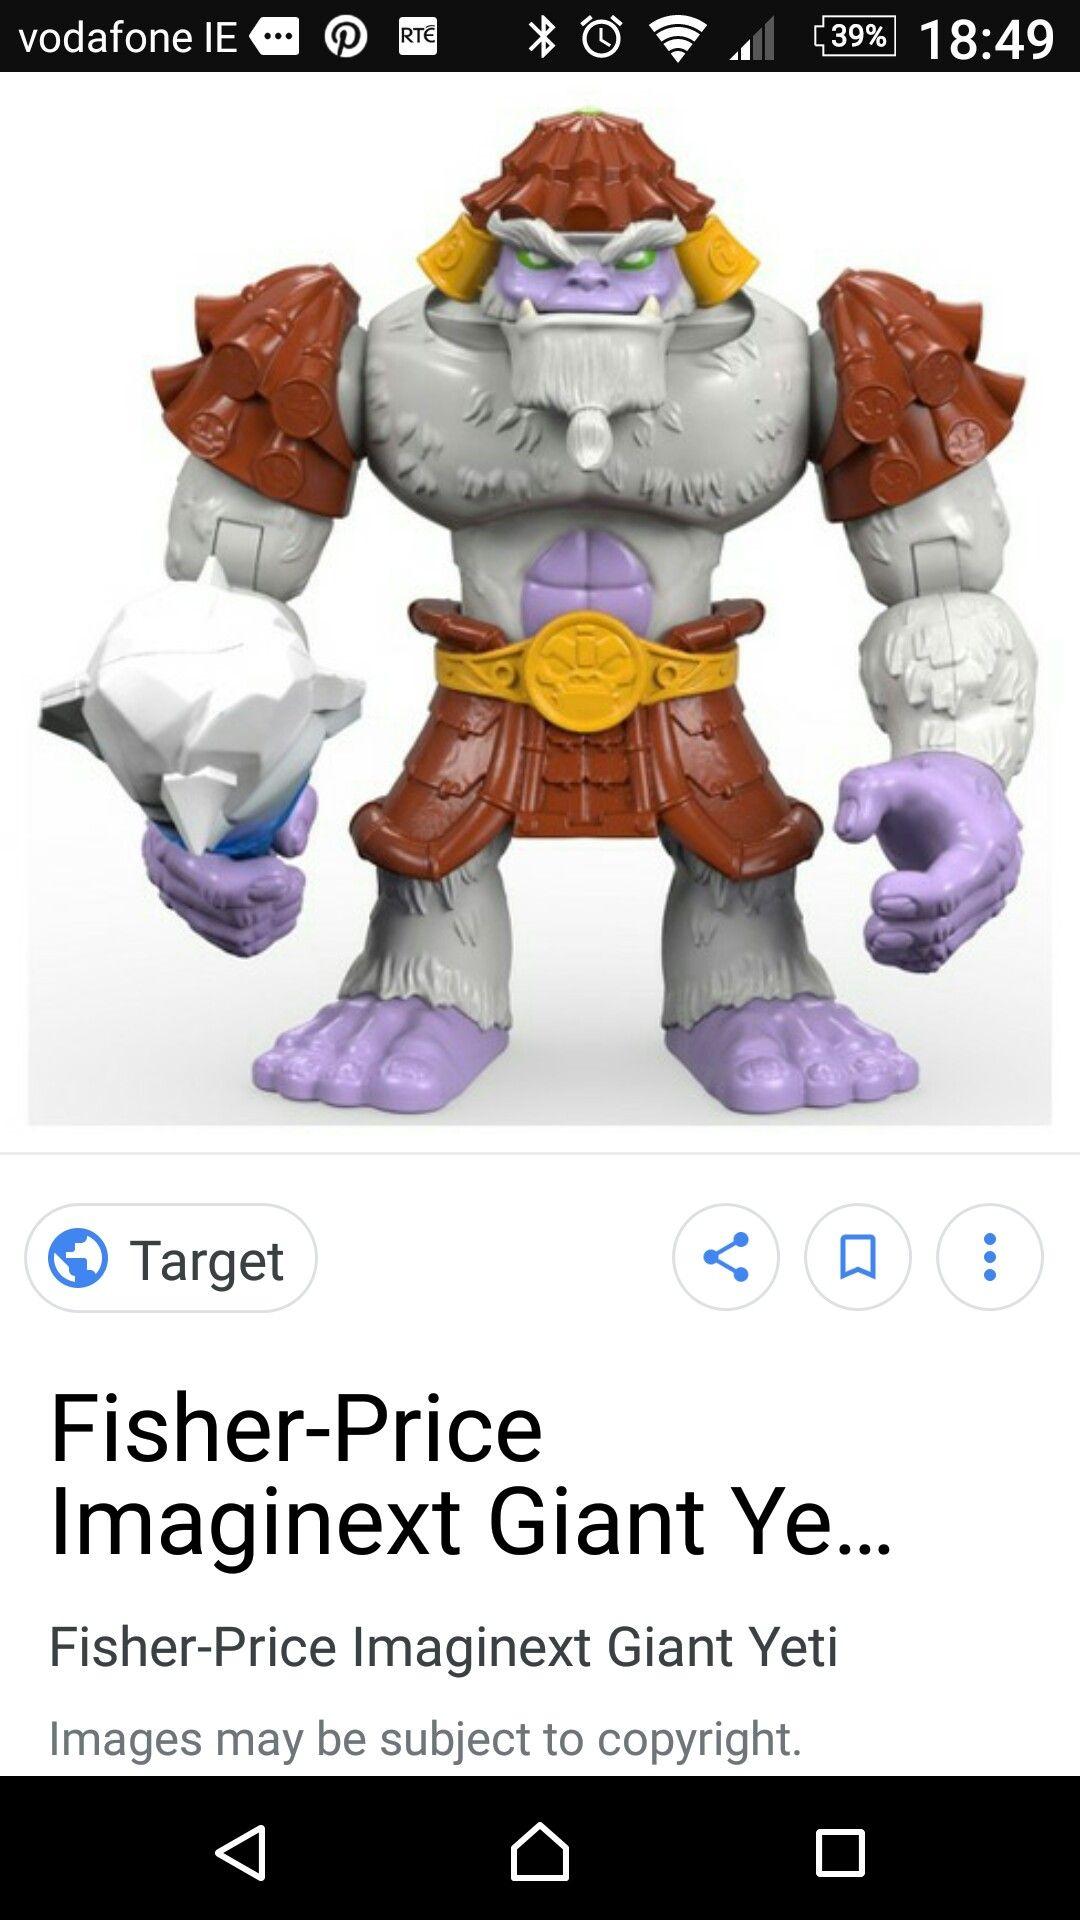 Pin by gypsybazaarshopify on Michaelus toys xmas